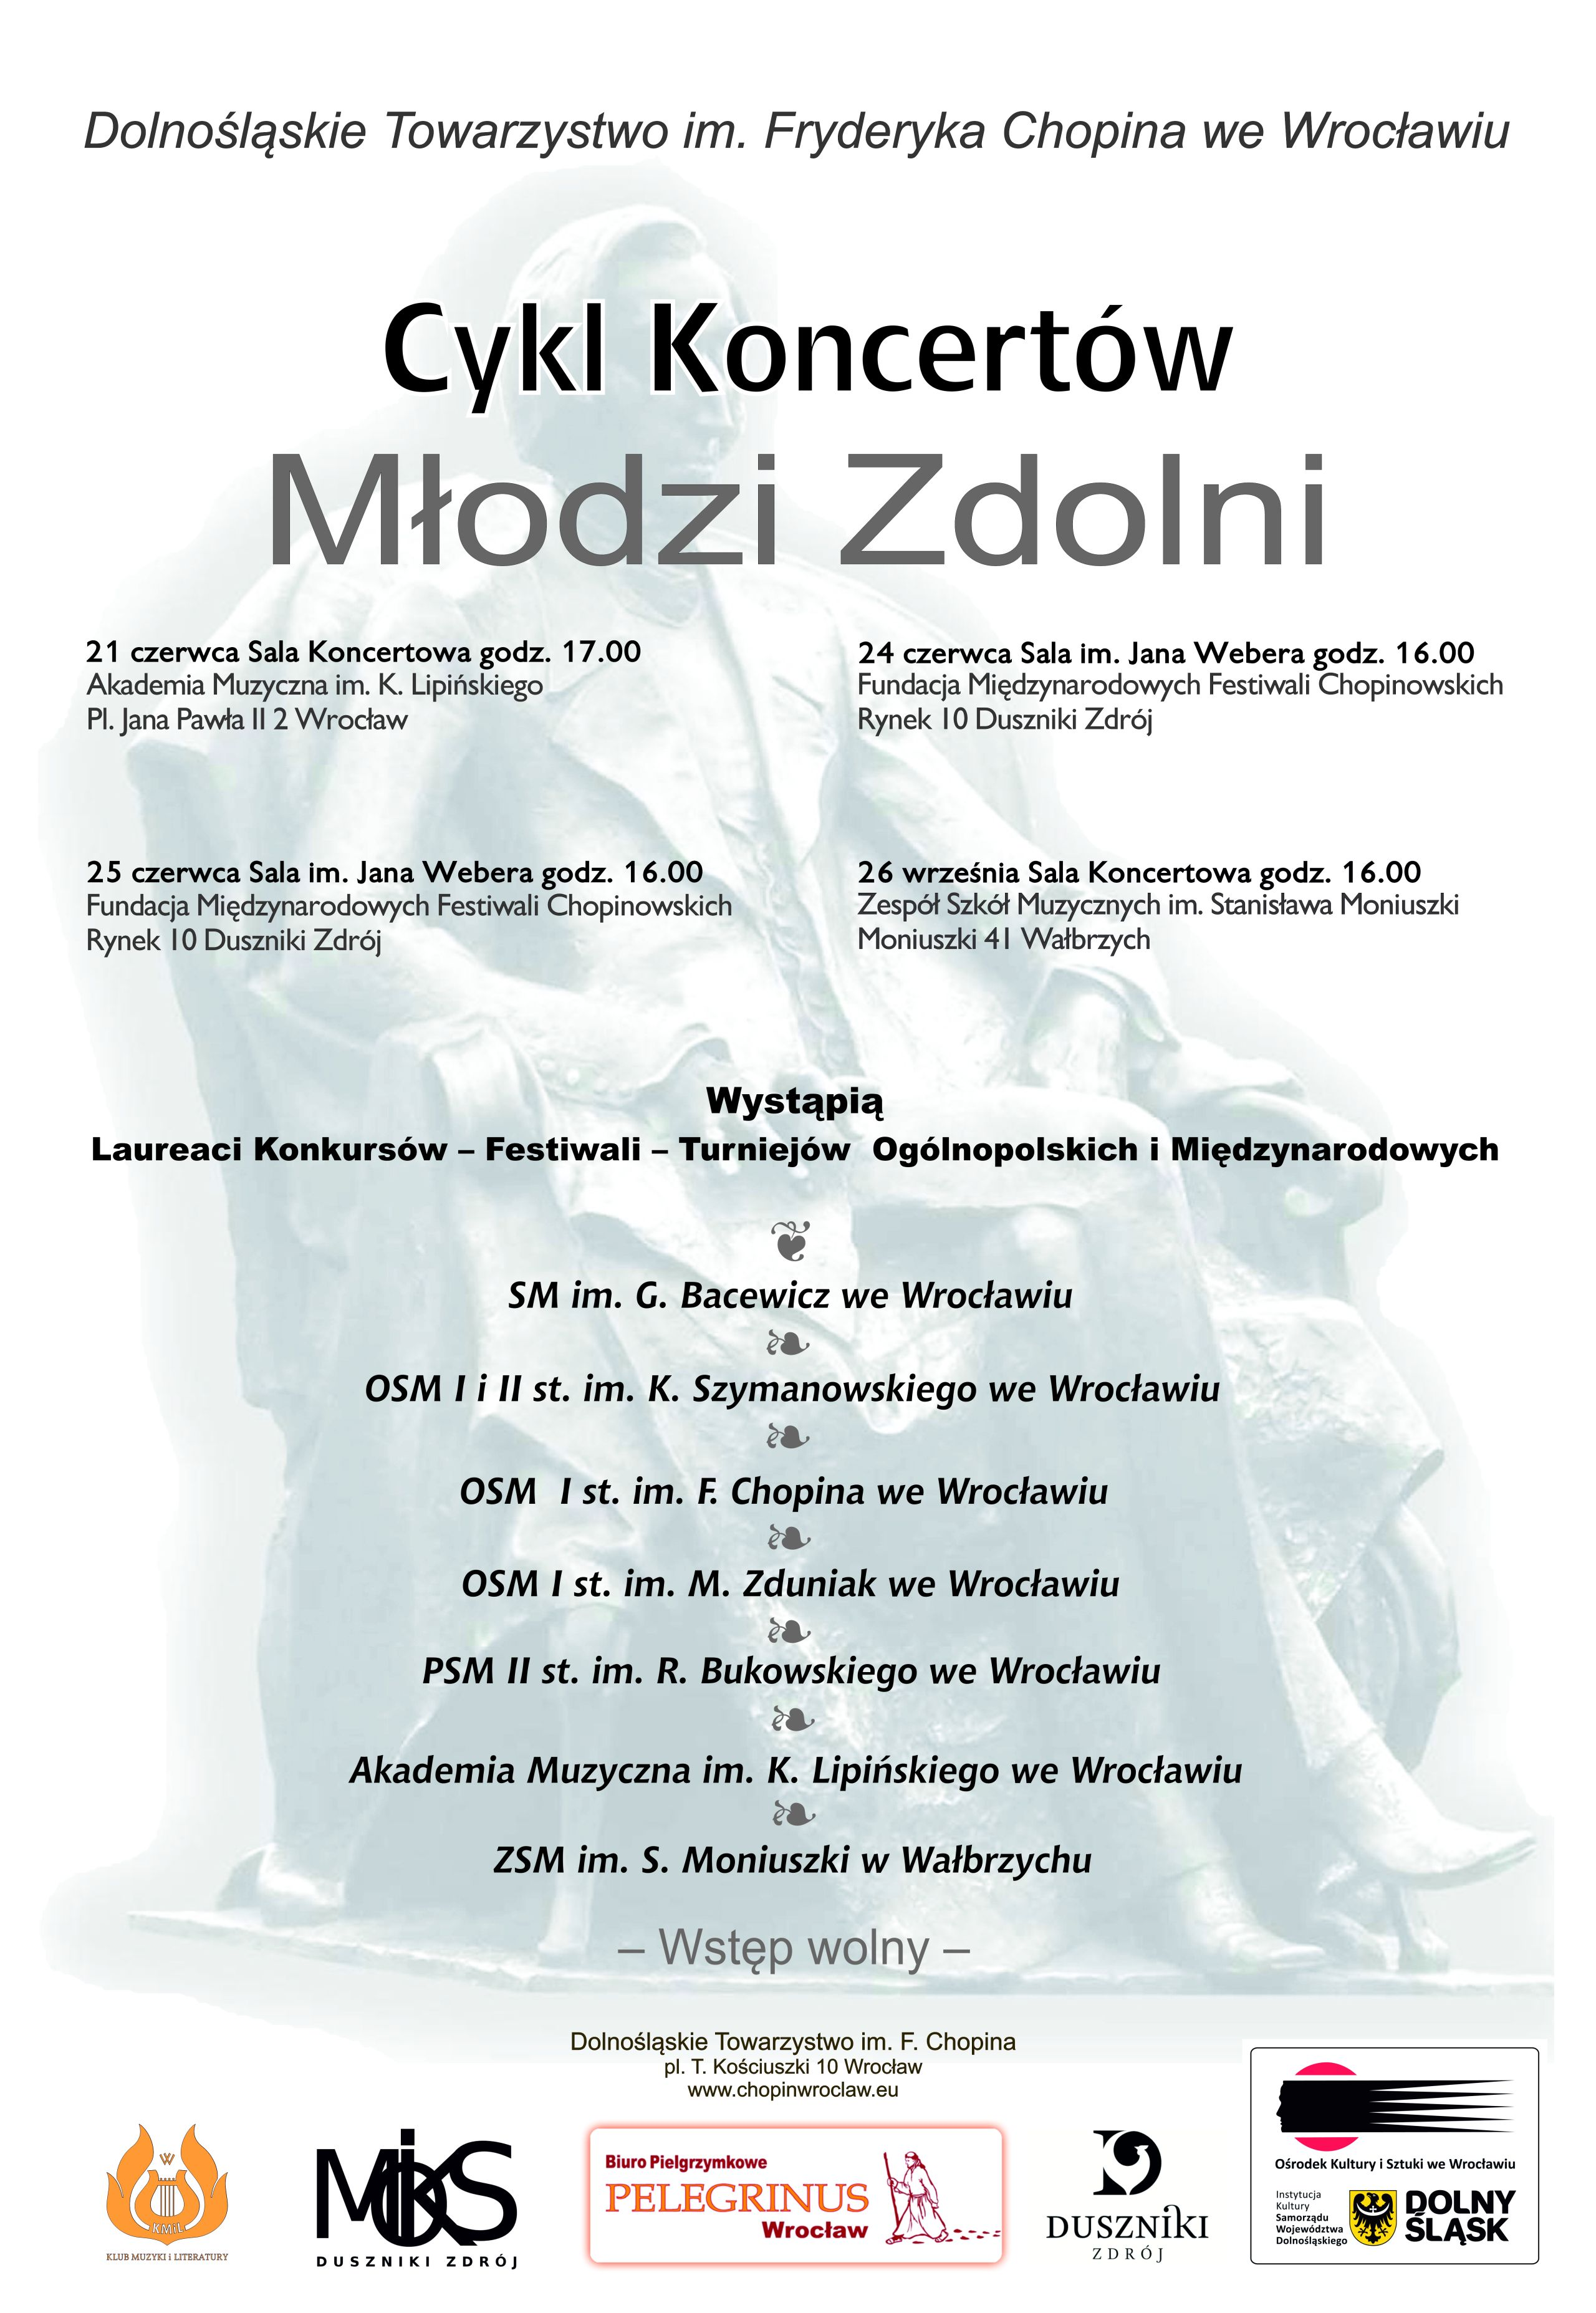 "Cykl Koncertów \"" data-mce-src="